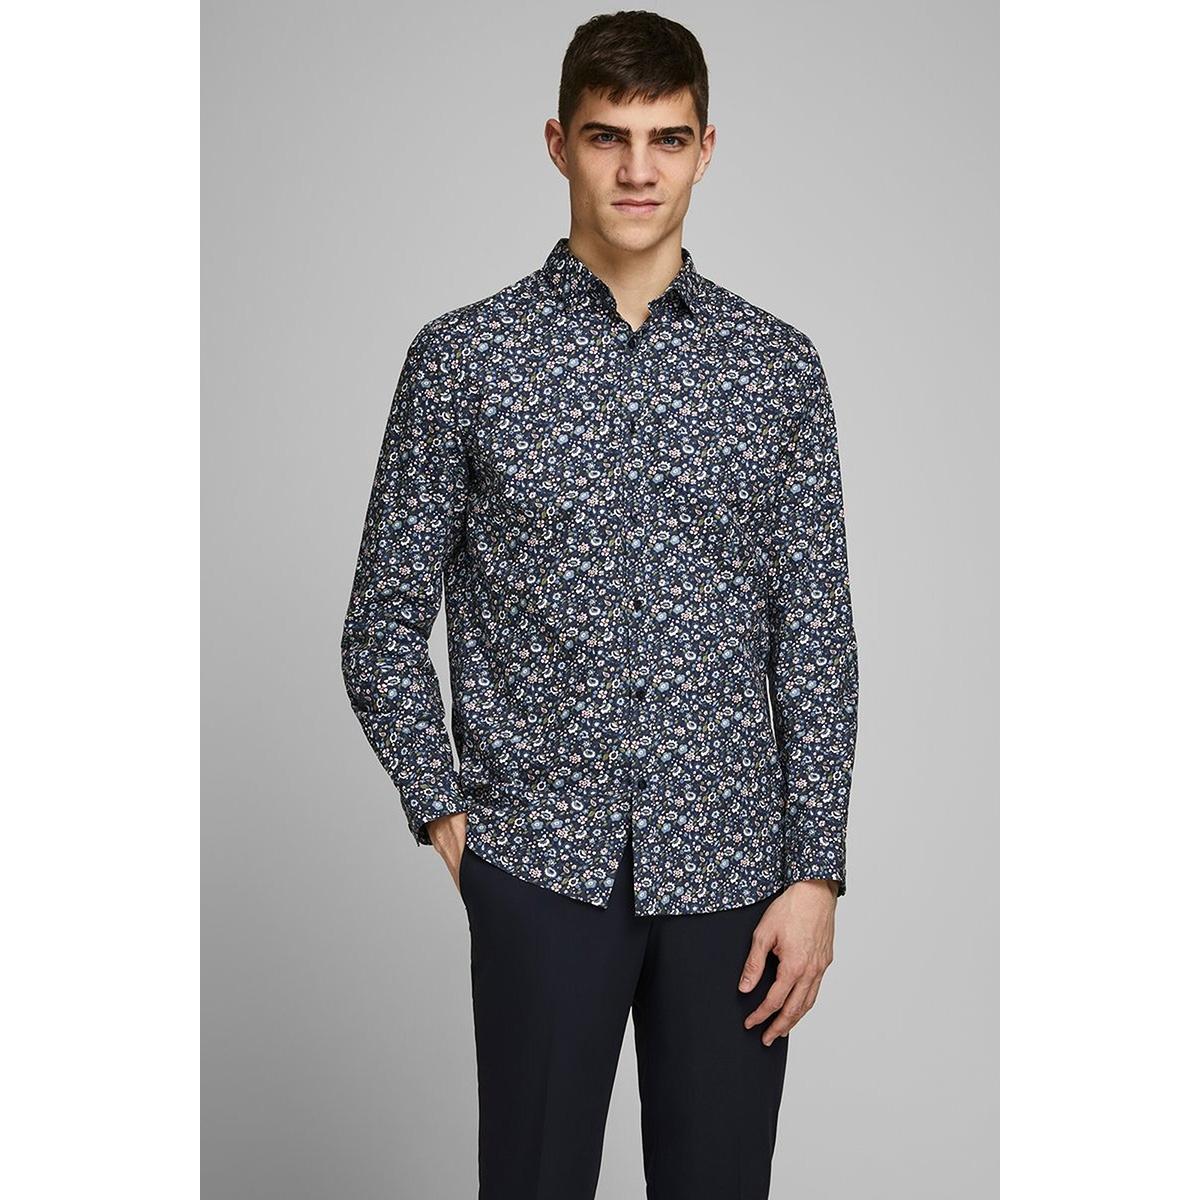 jprblablackpool shirt l/s s20 sts 12168452 jack & jones overhemd navy blazer/slim fit